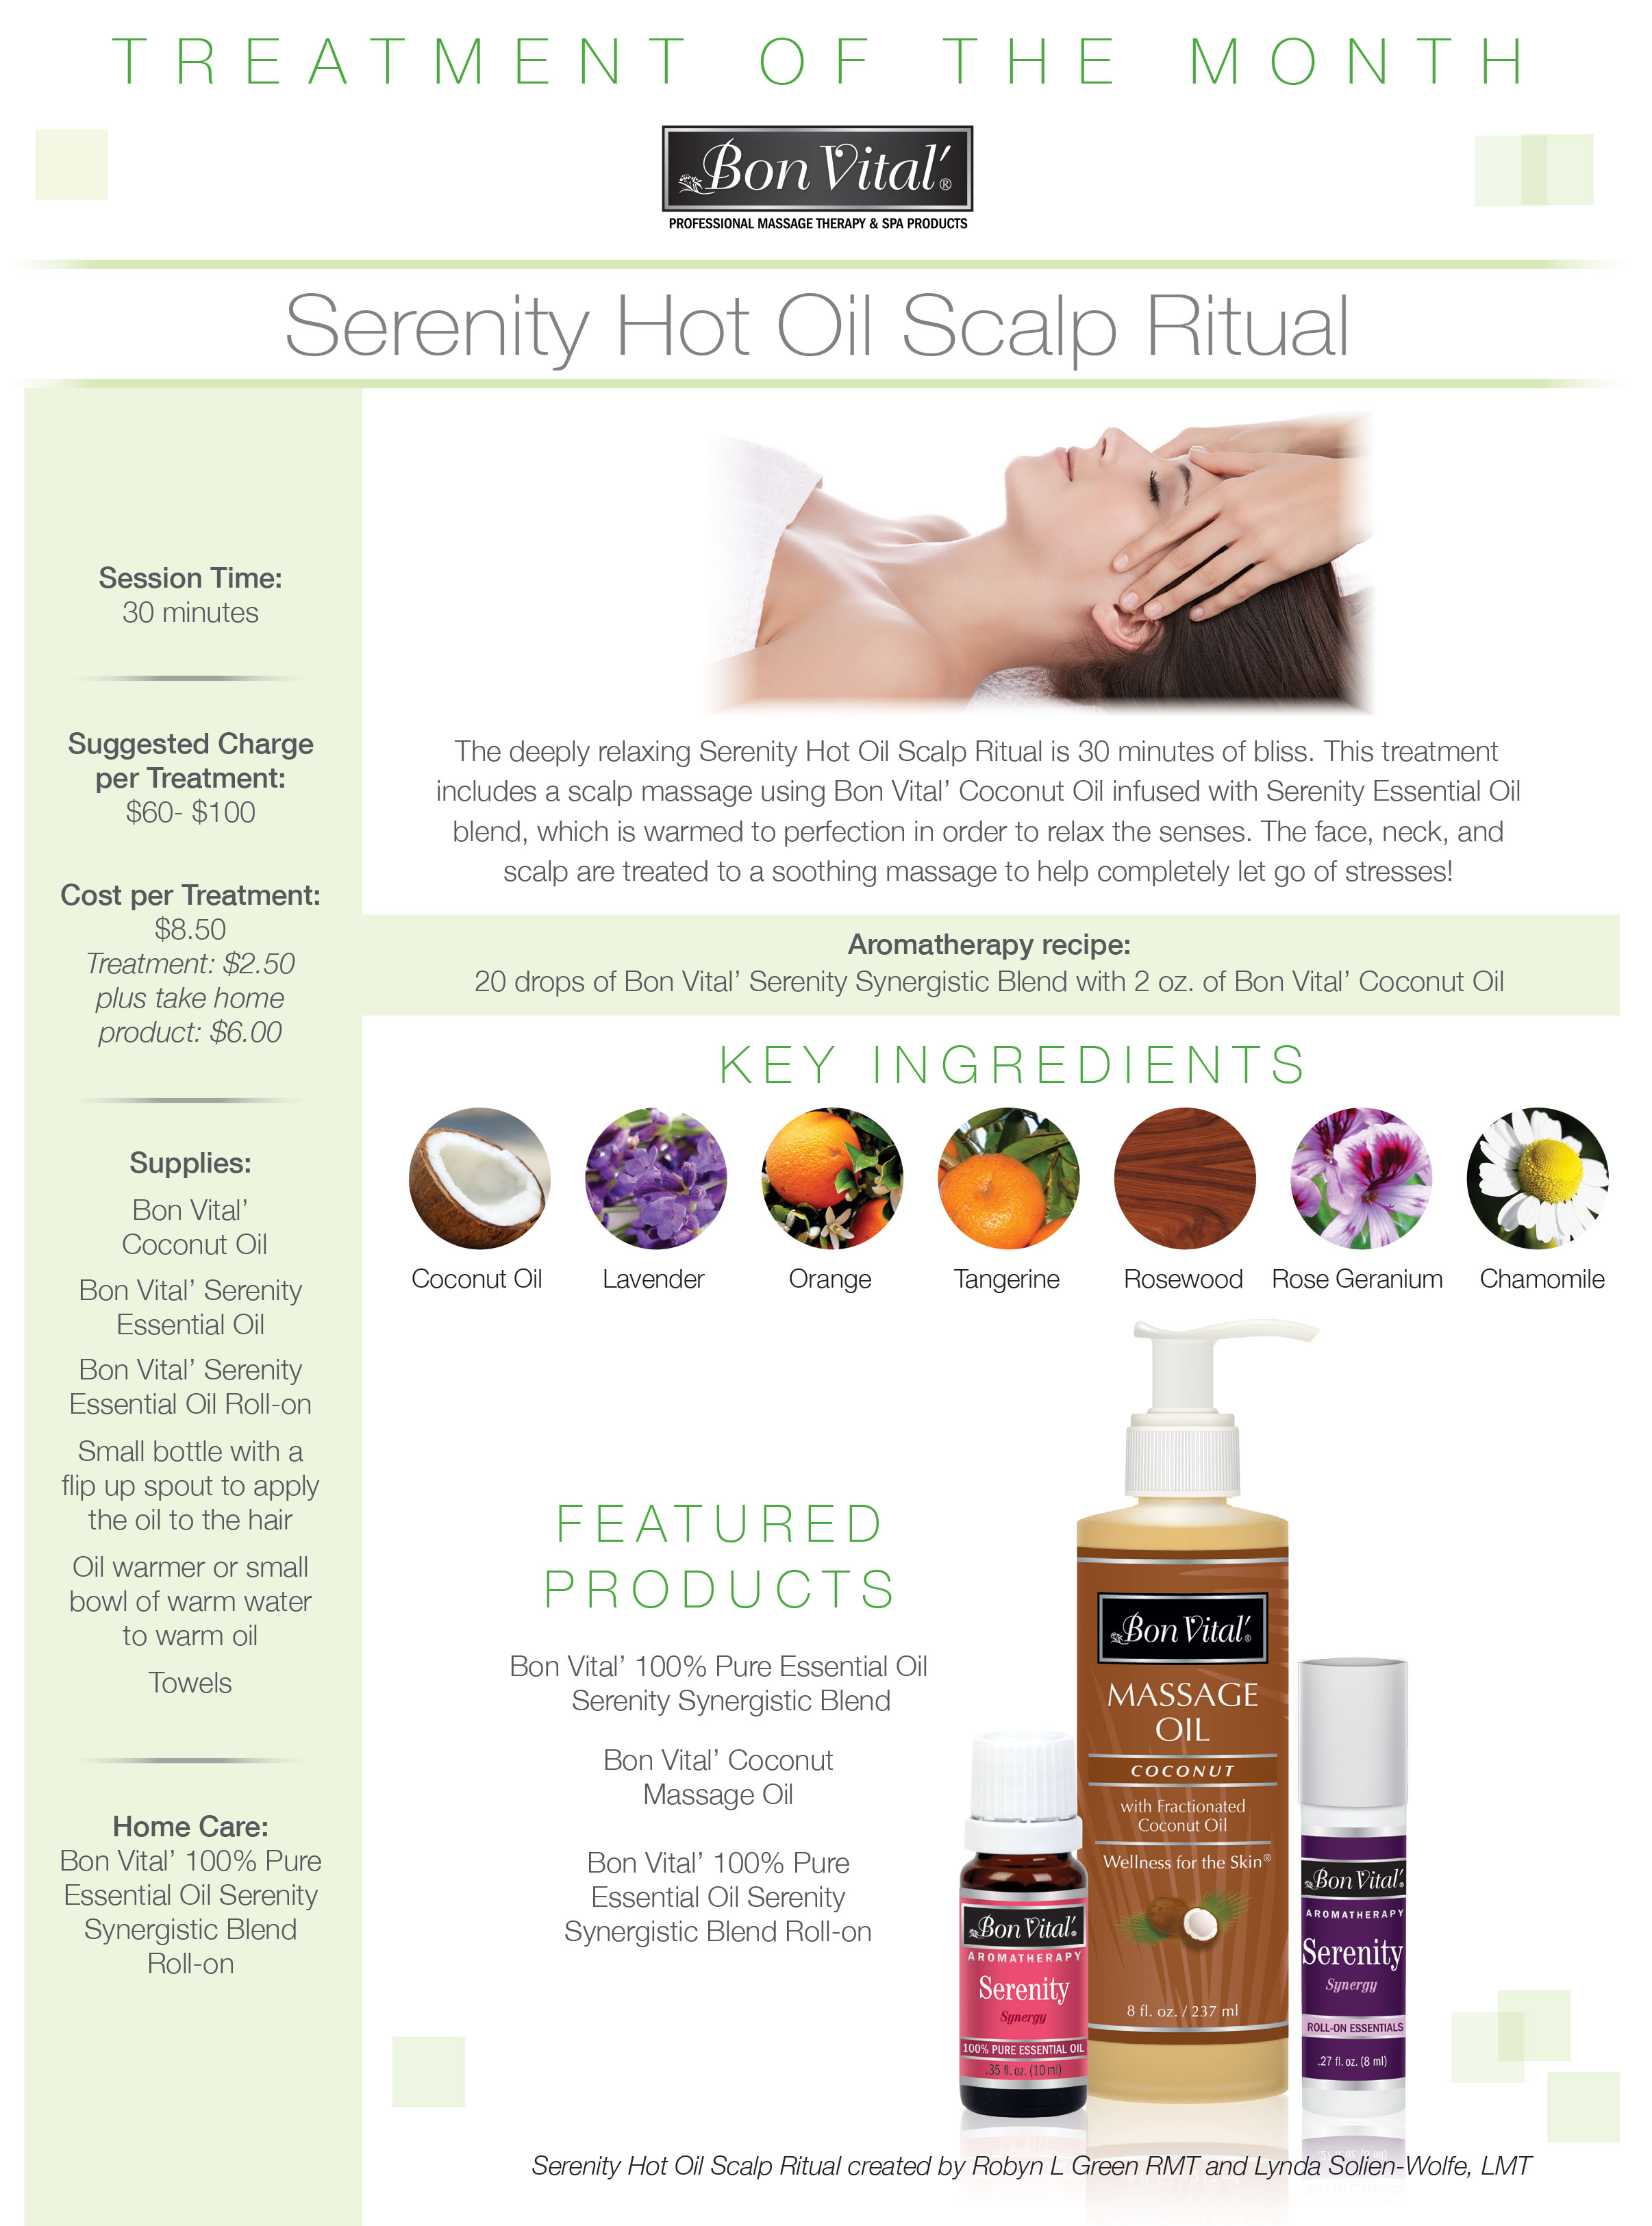 Serenity Hot Oil Scalp Ritual